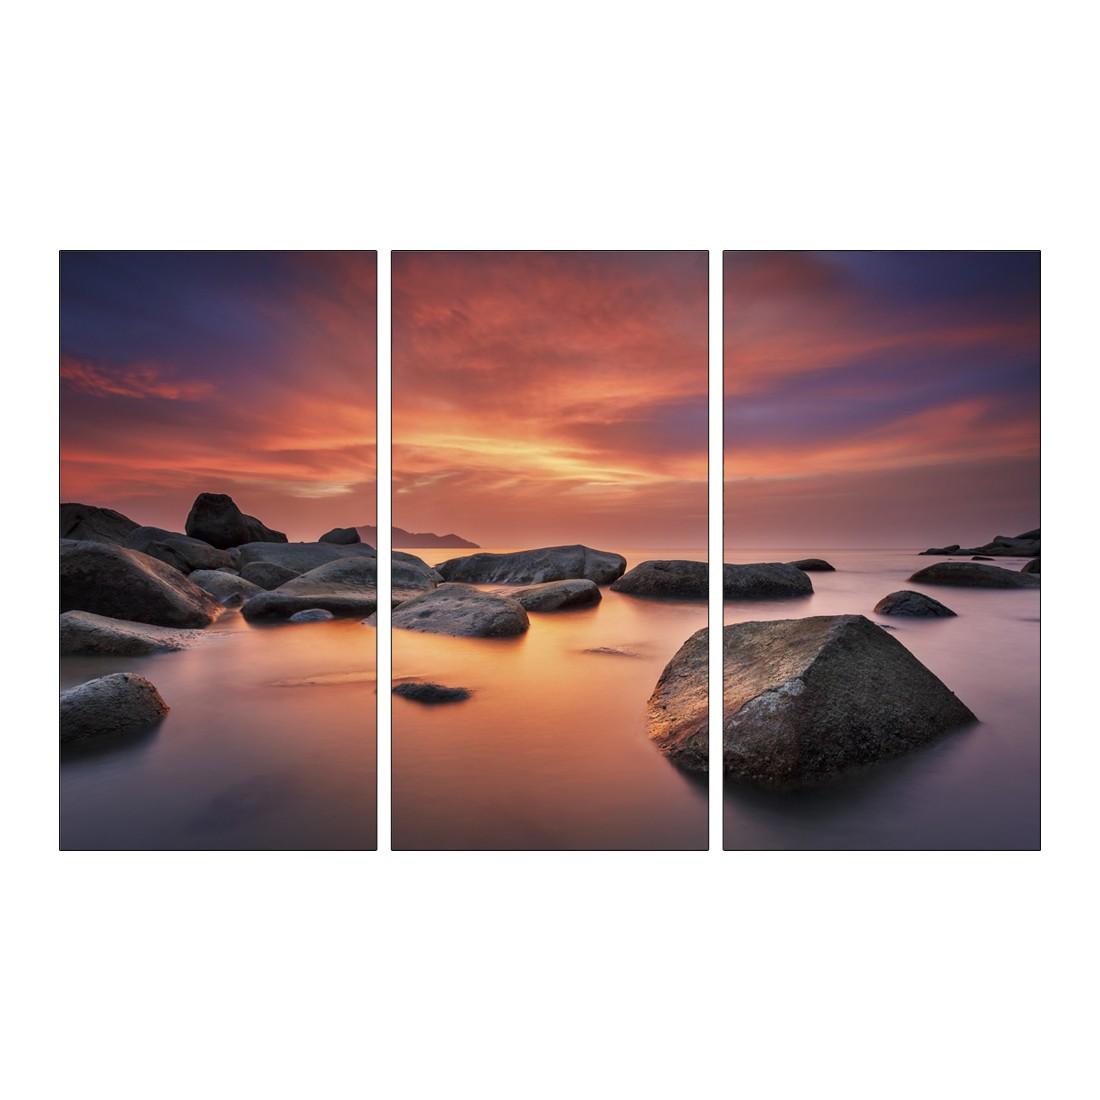 Leinwandbild GLOWING SKY, ROCKY SEA  – Abmessung 130 x 80 cm, Gallery of Innovative Art günstig bestellen